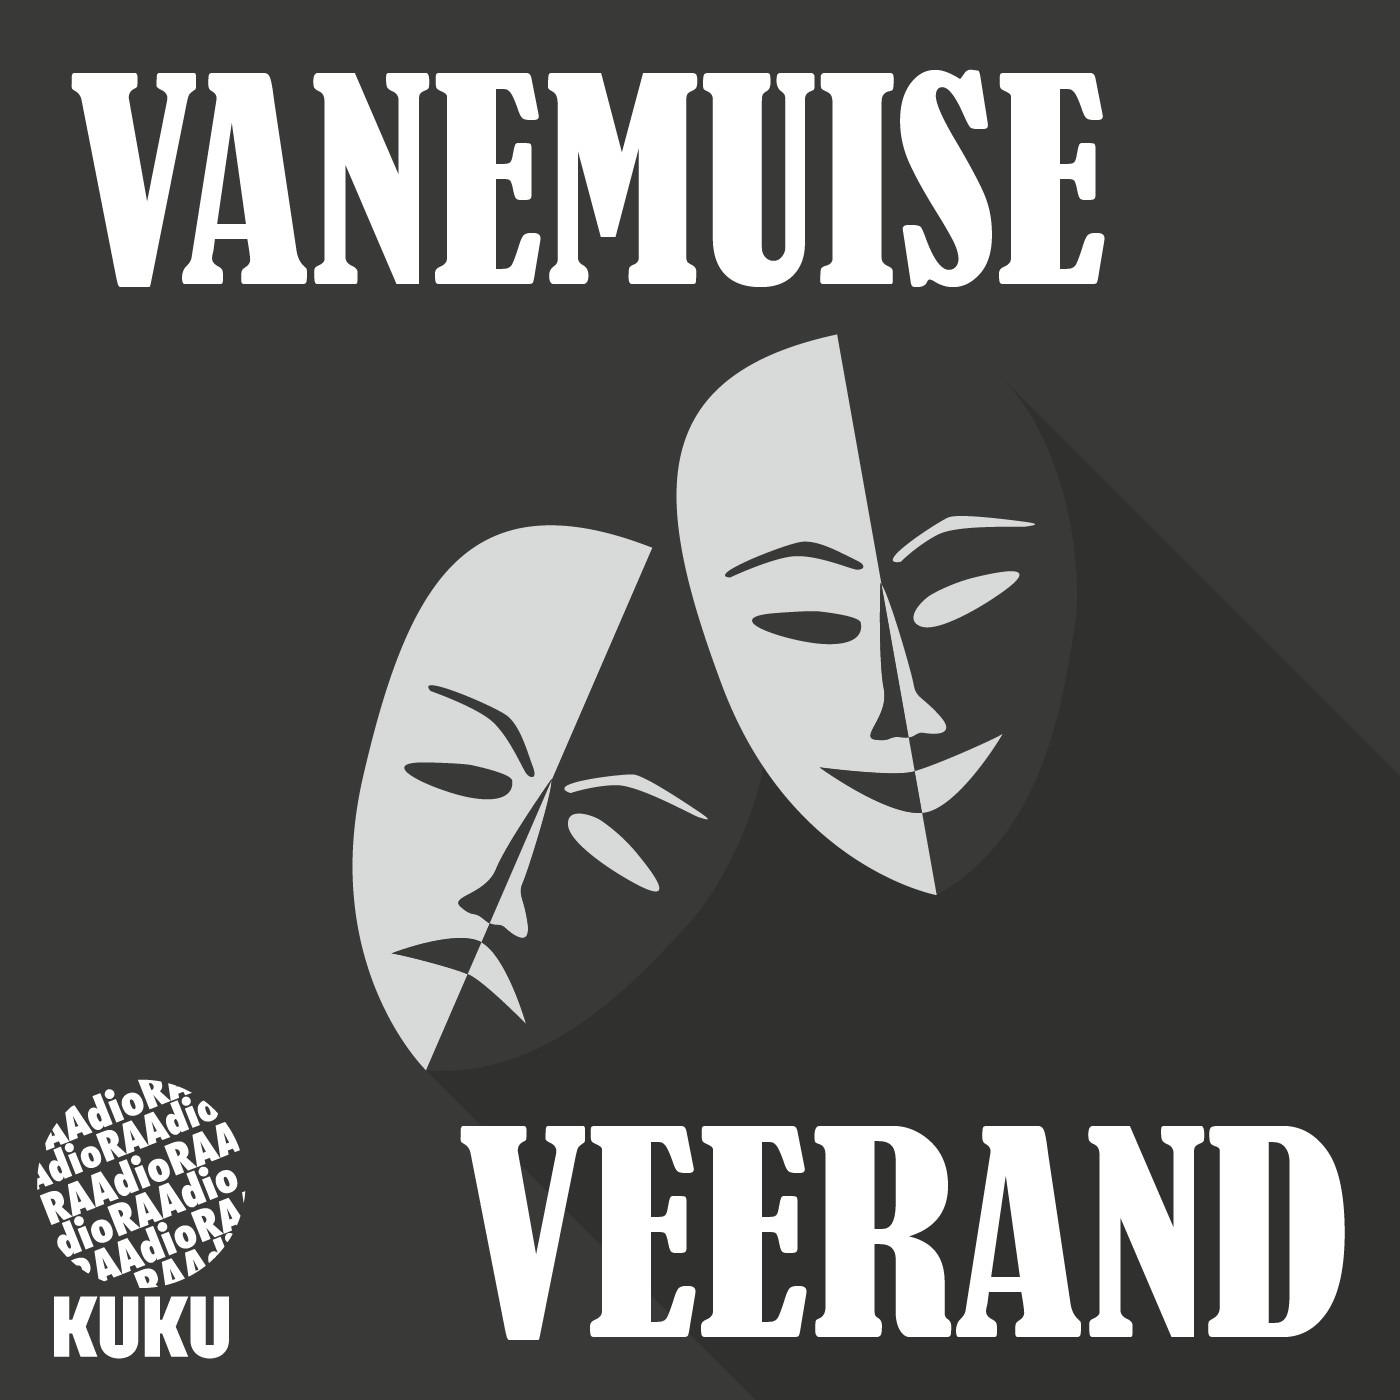 Vanemuise Veerand